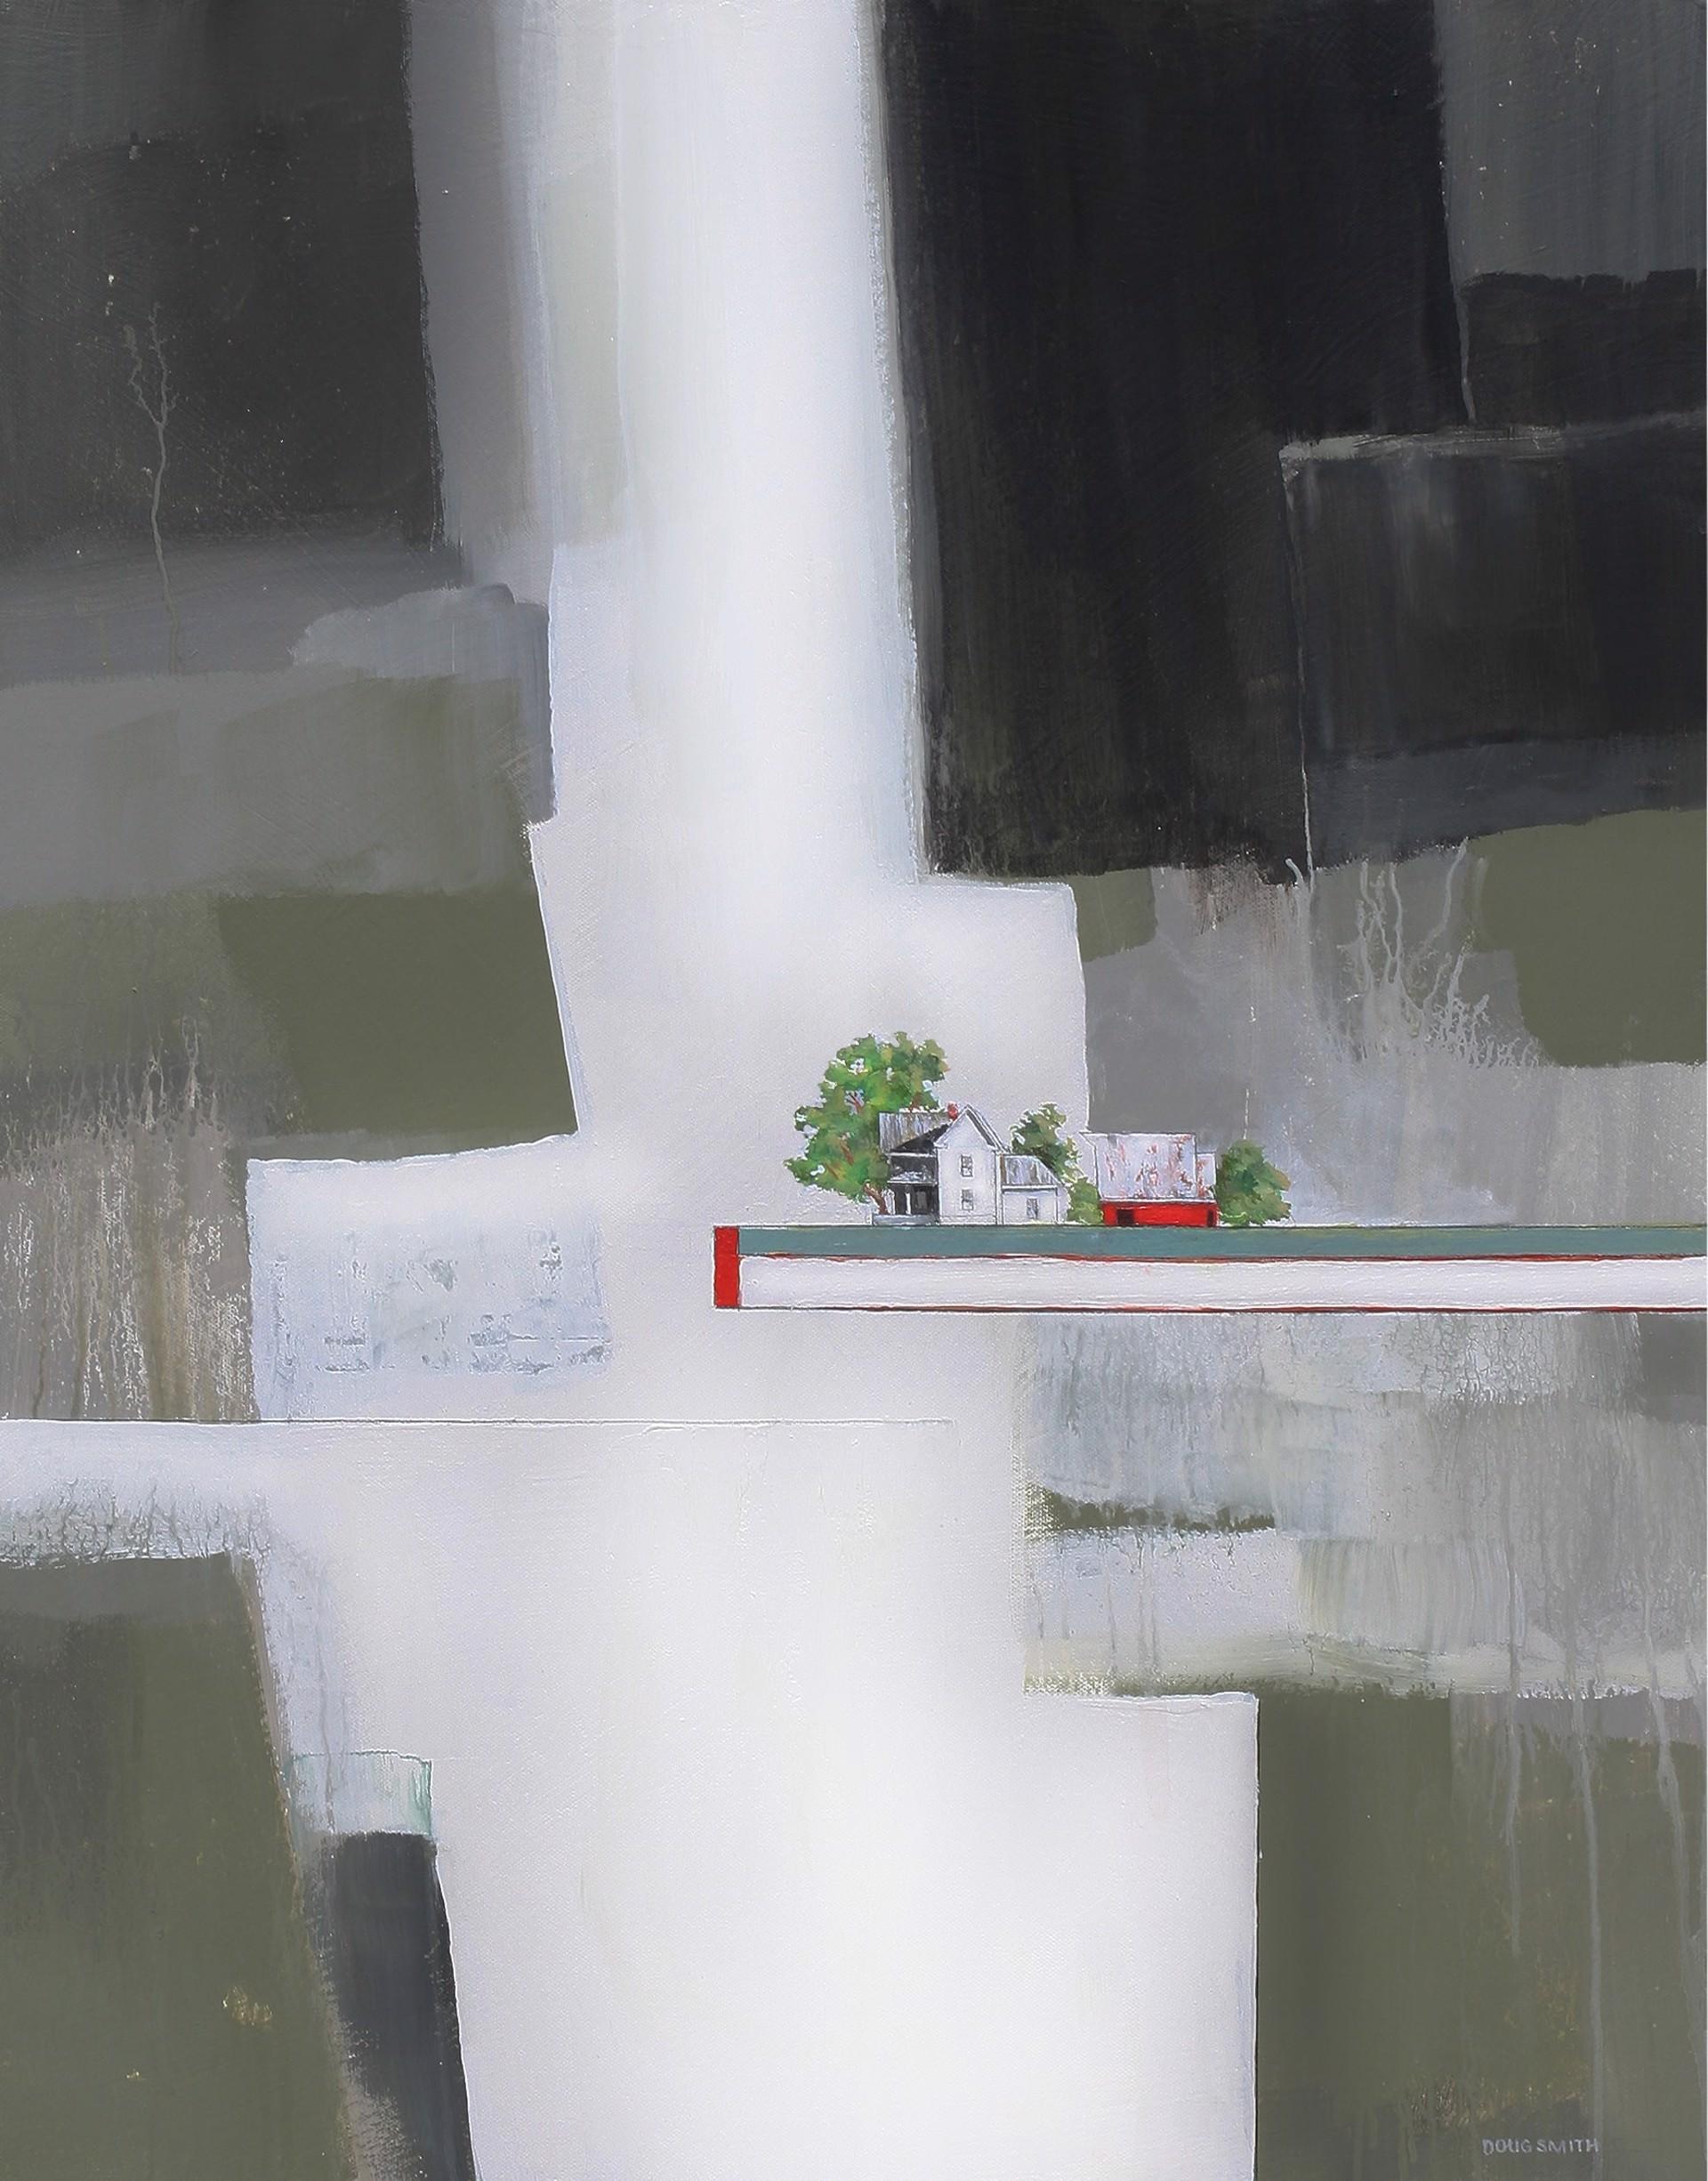 Shades of Gray by Doug Smith